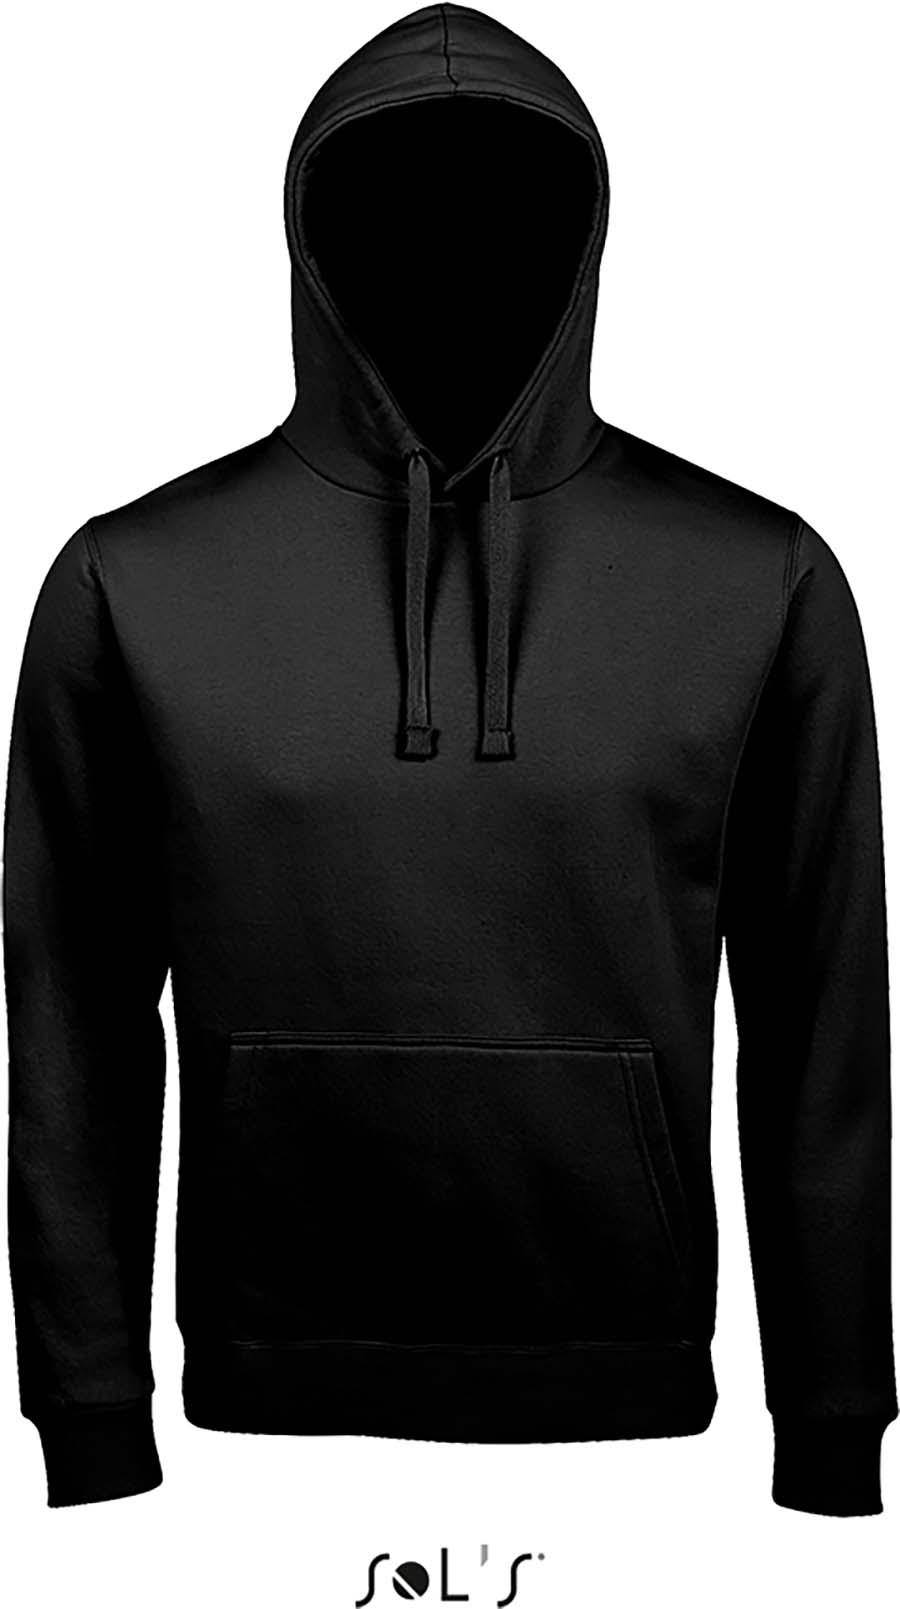 Sweat-shirt unisexe à capuche - 1-1403-9